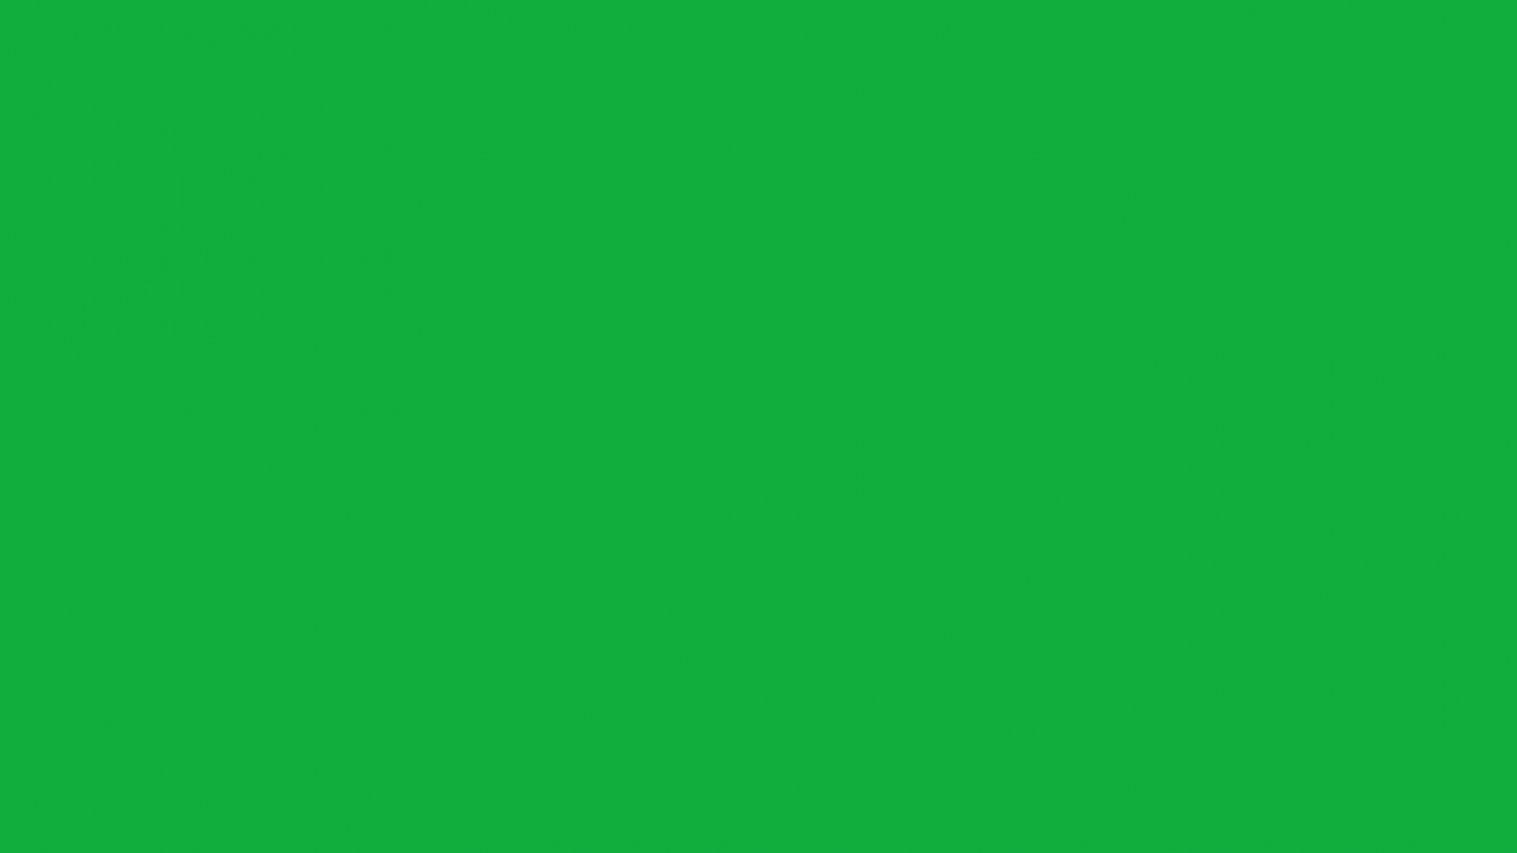 Grüne Fläche